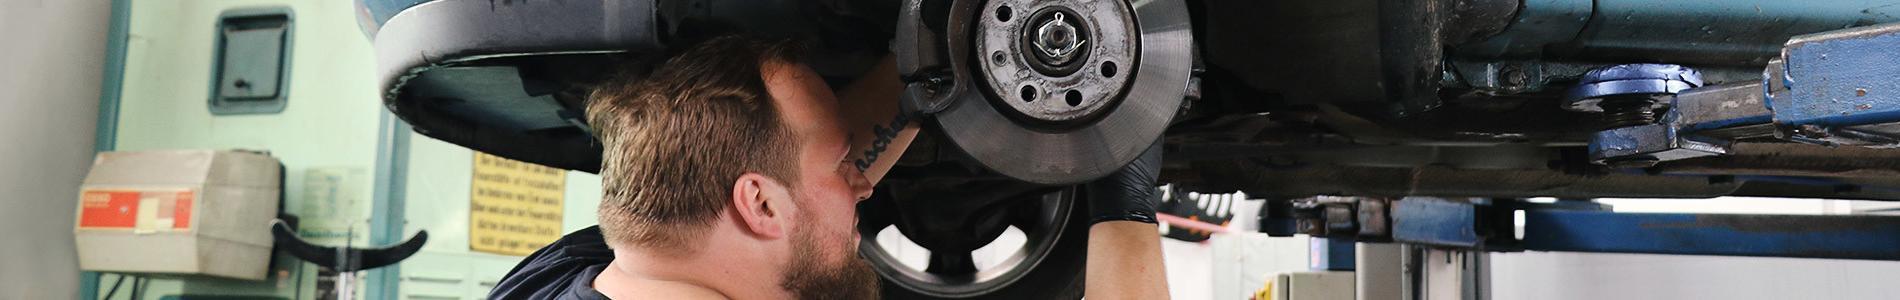 Bremsen-Service bei Autoservice Keck